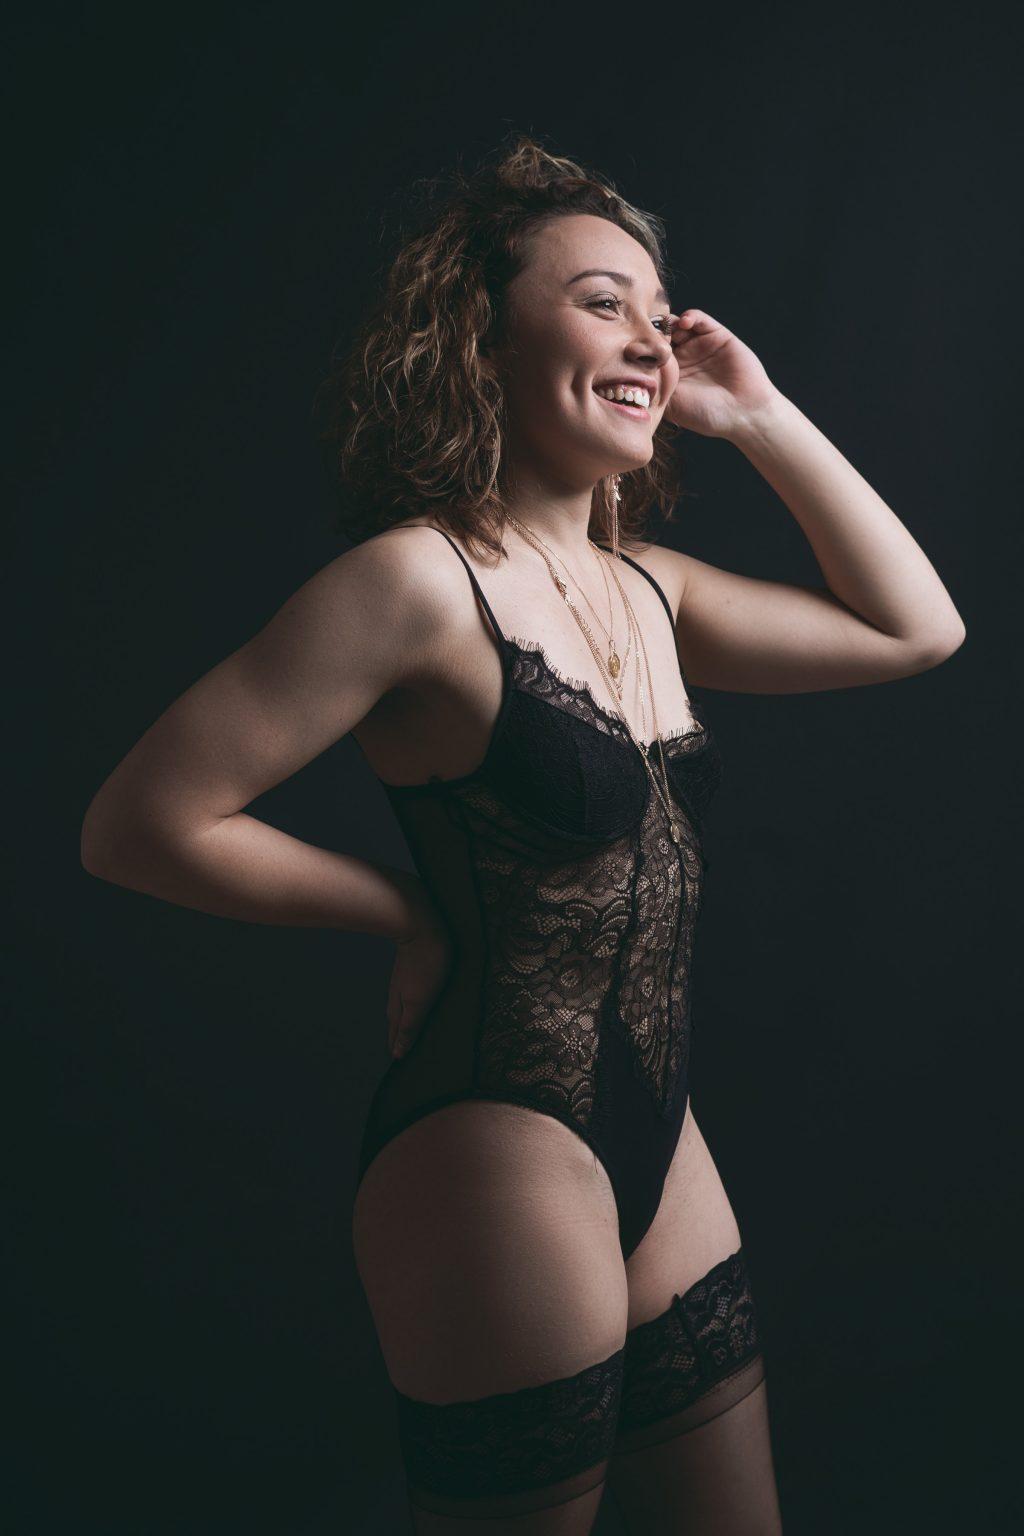 cancer sang studio fond noir lingerie